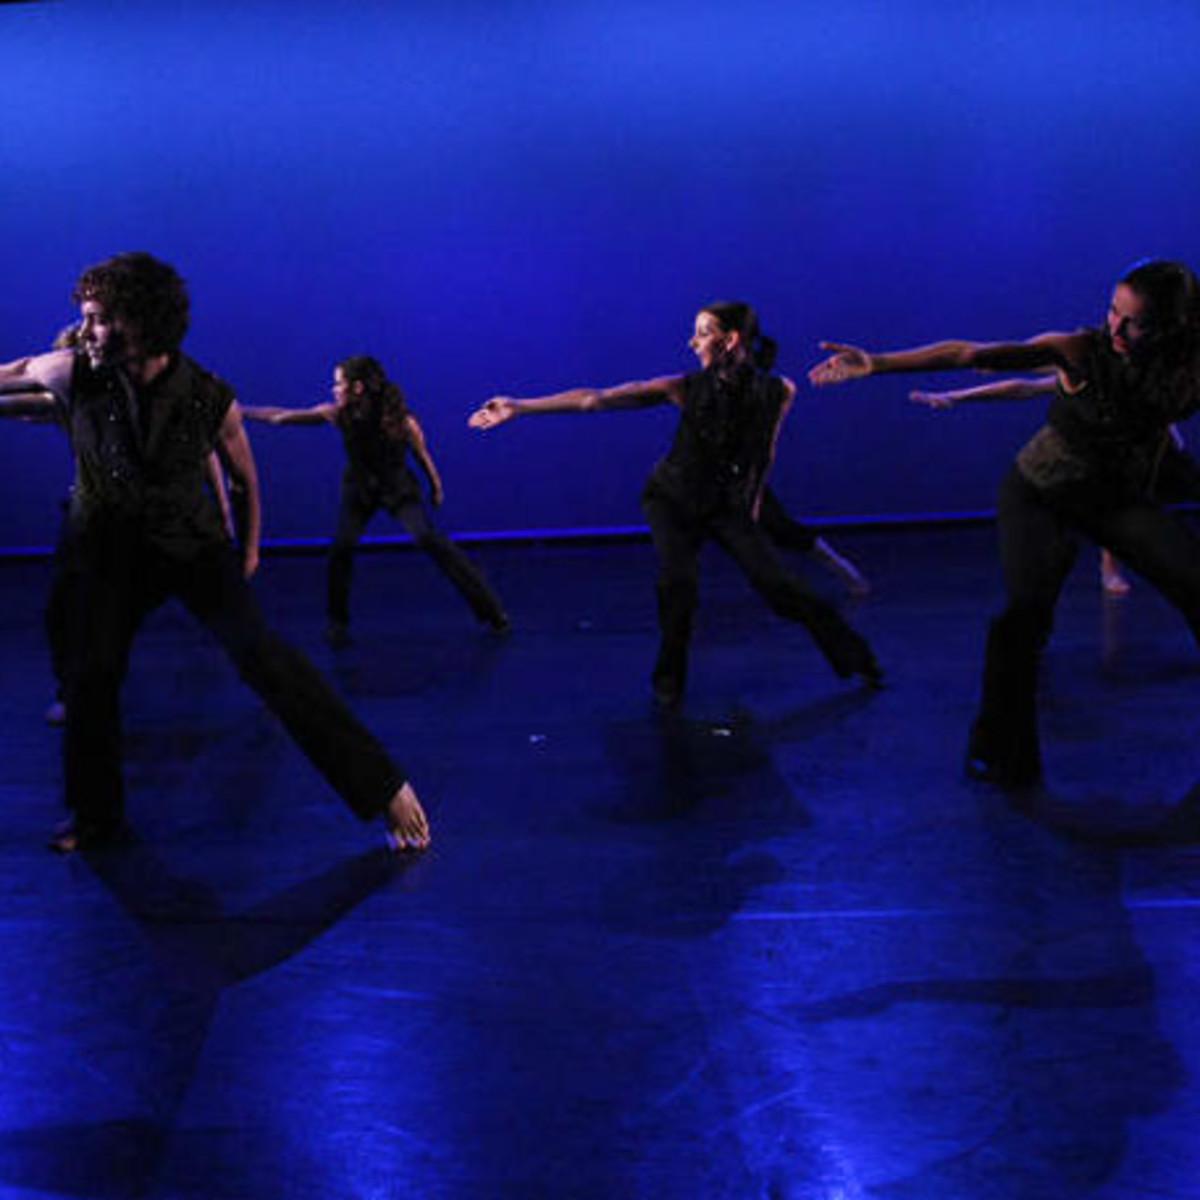 News_Nancy_weekend_Revolve Dance Company_Synchronicity